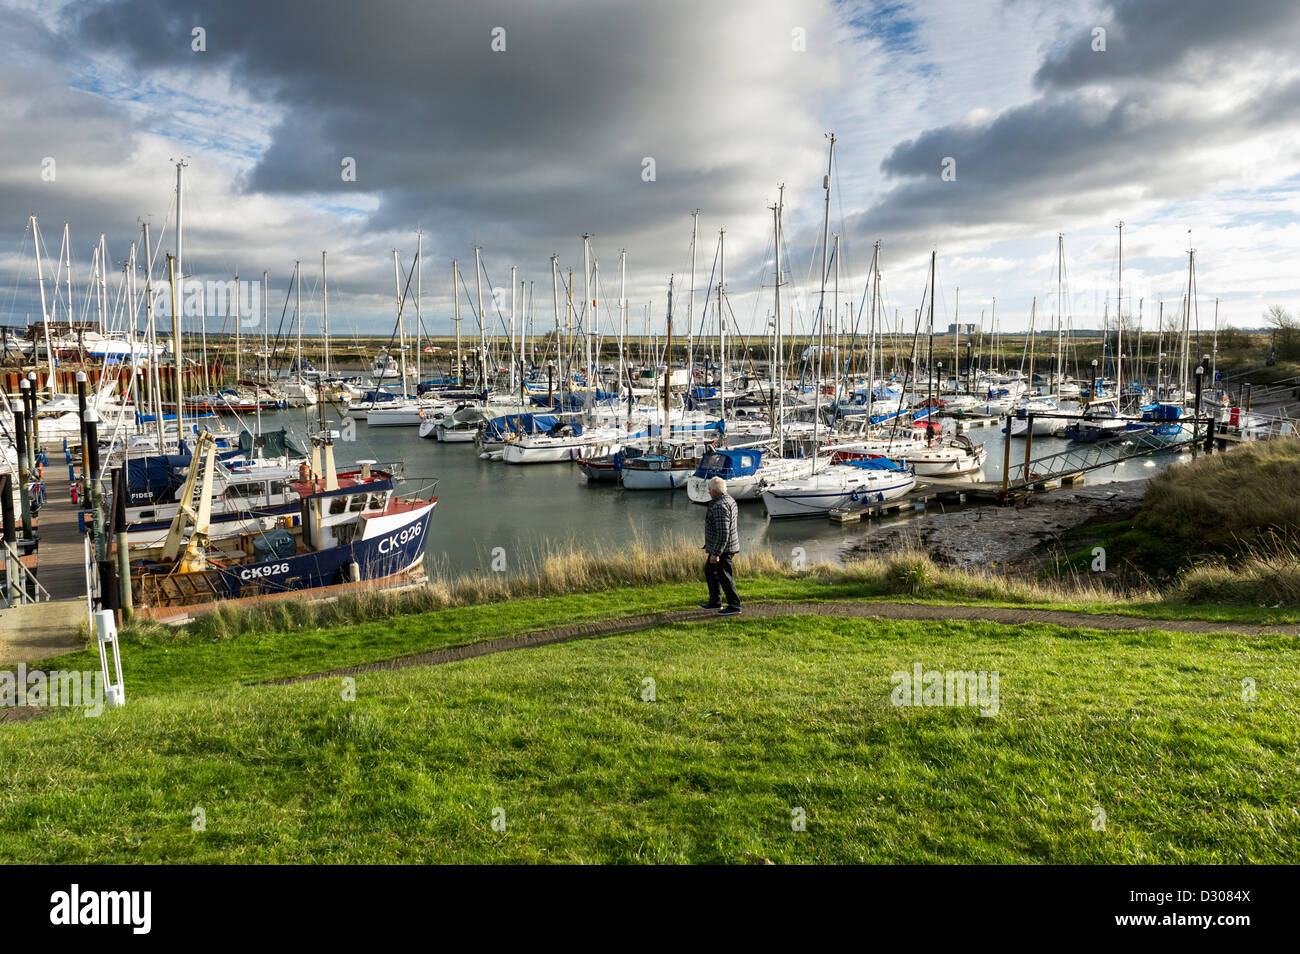 Tollesbury Marina, Maldon, Essex, UK - Stock Image